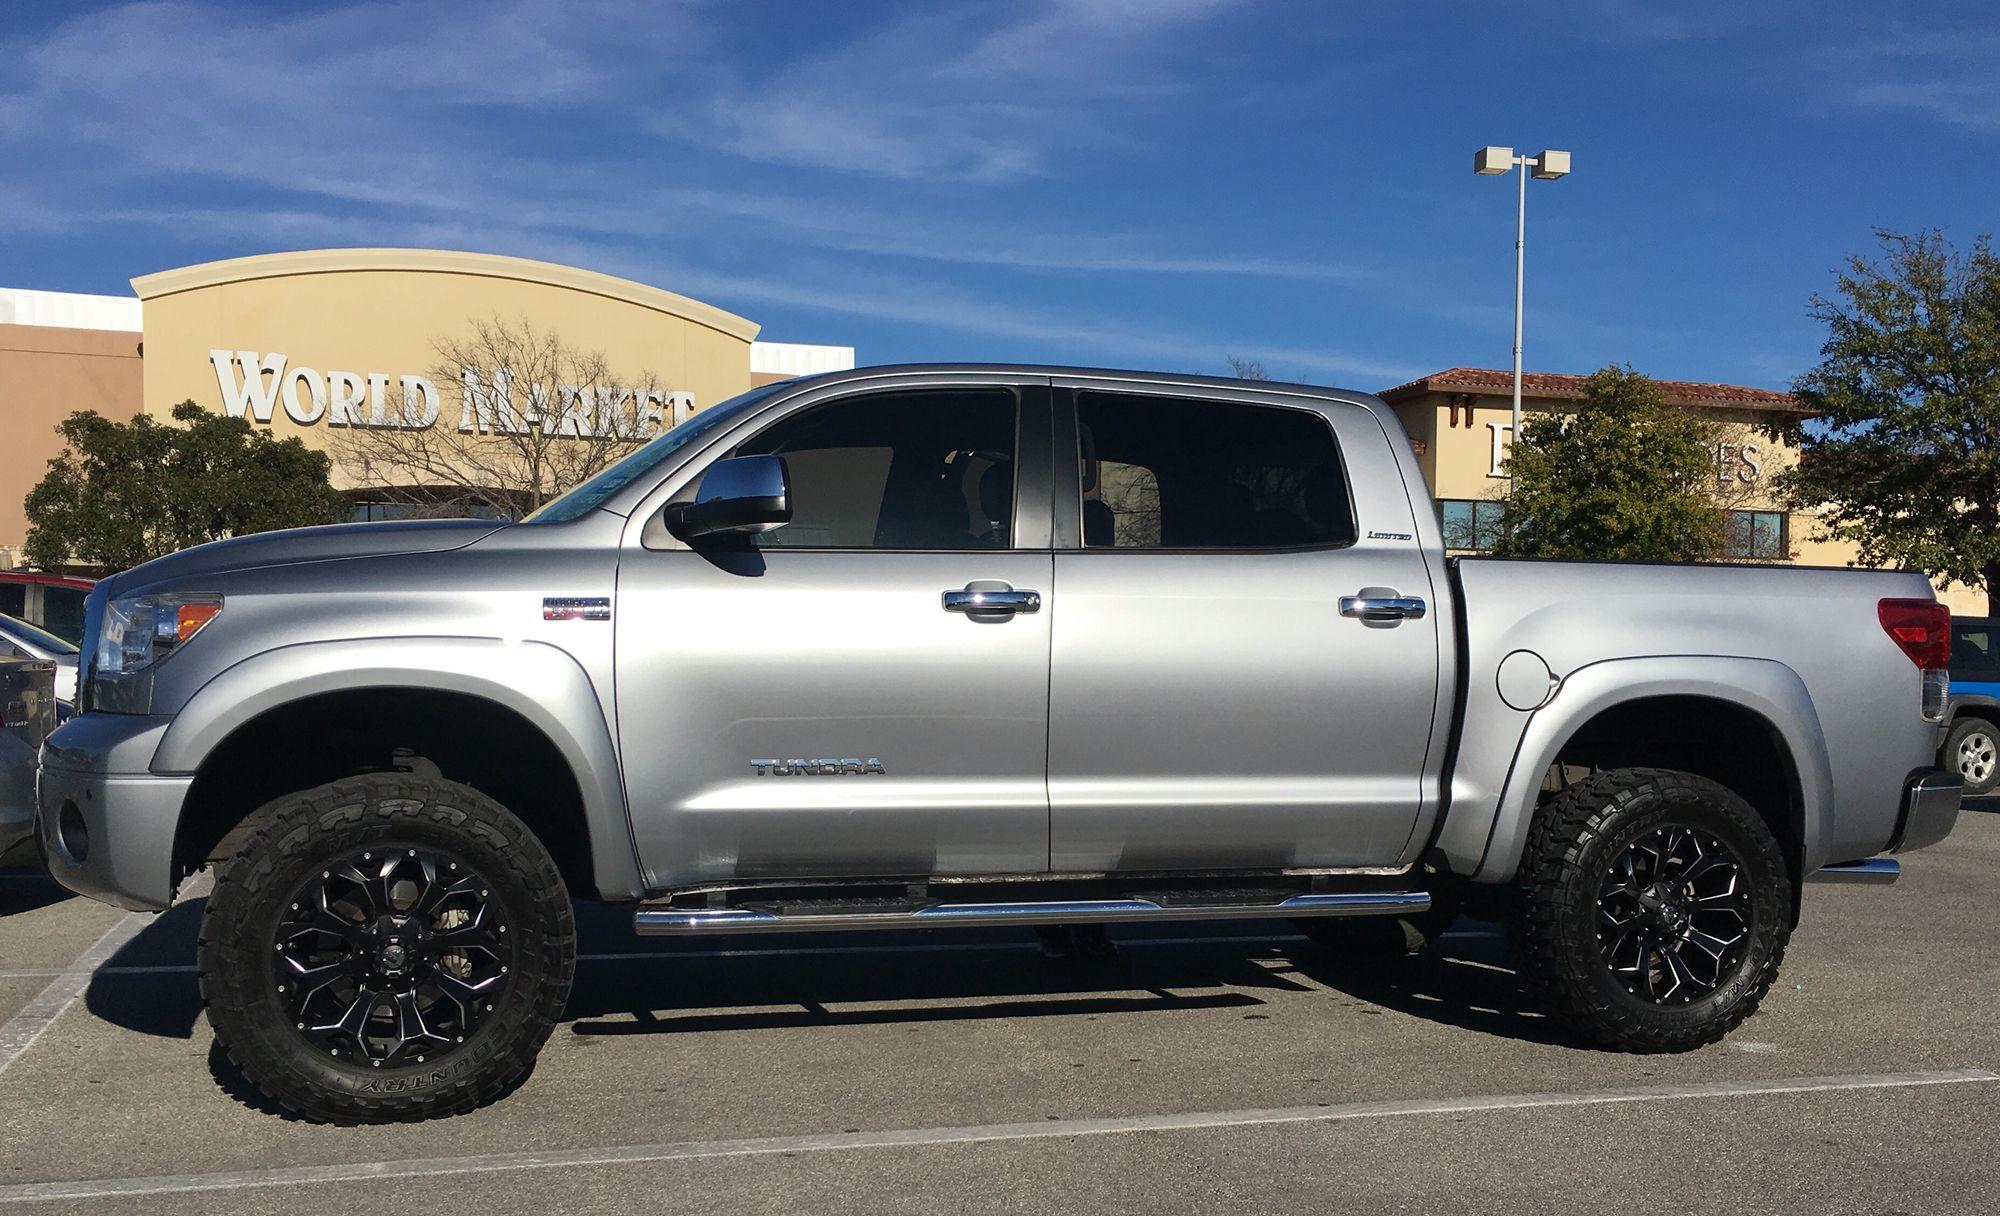 Toyota tundra crewmax 4x4 bds suspension 35 toyo mts fuel wheels